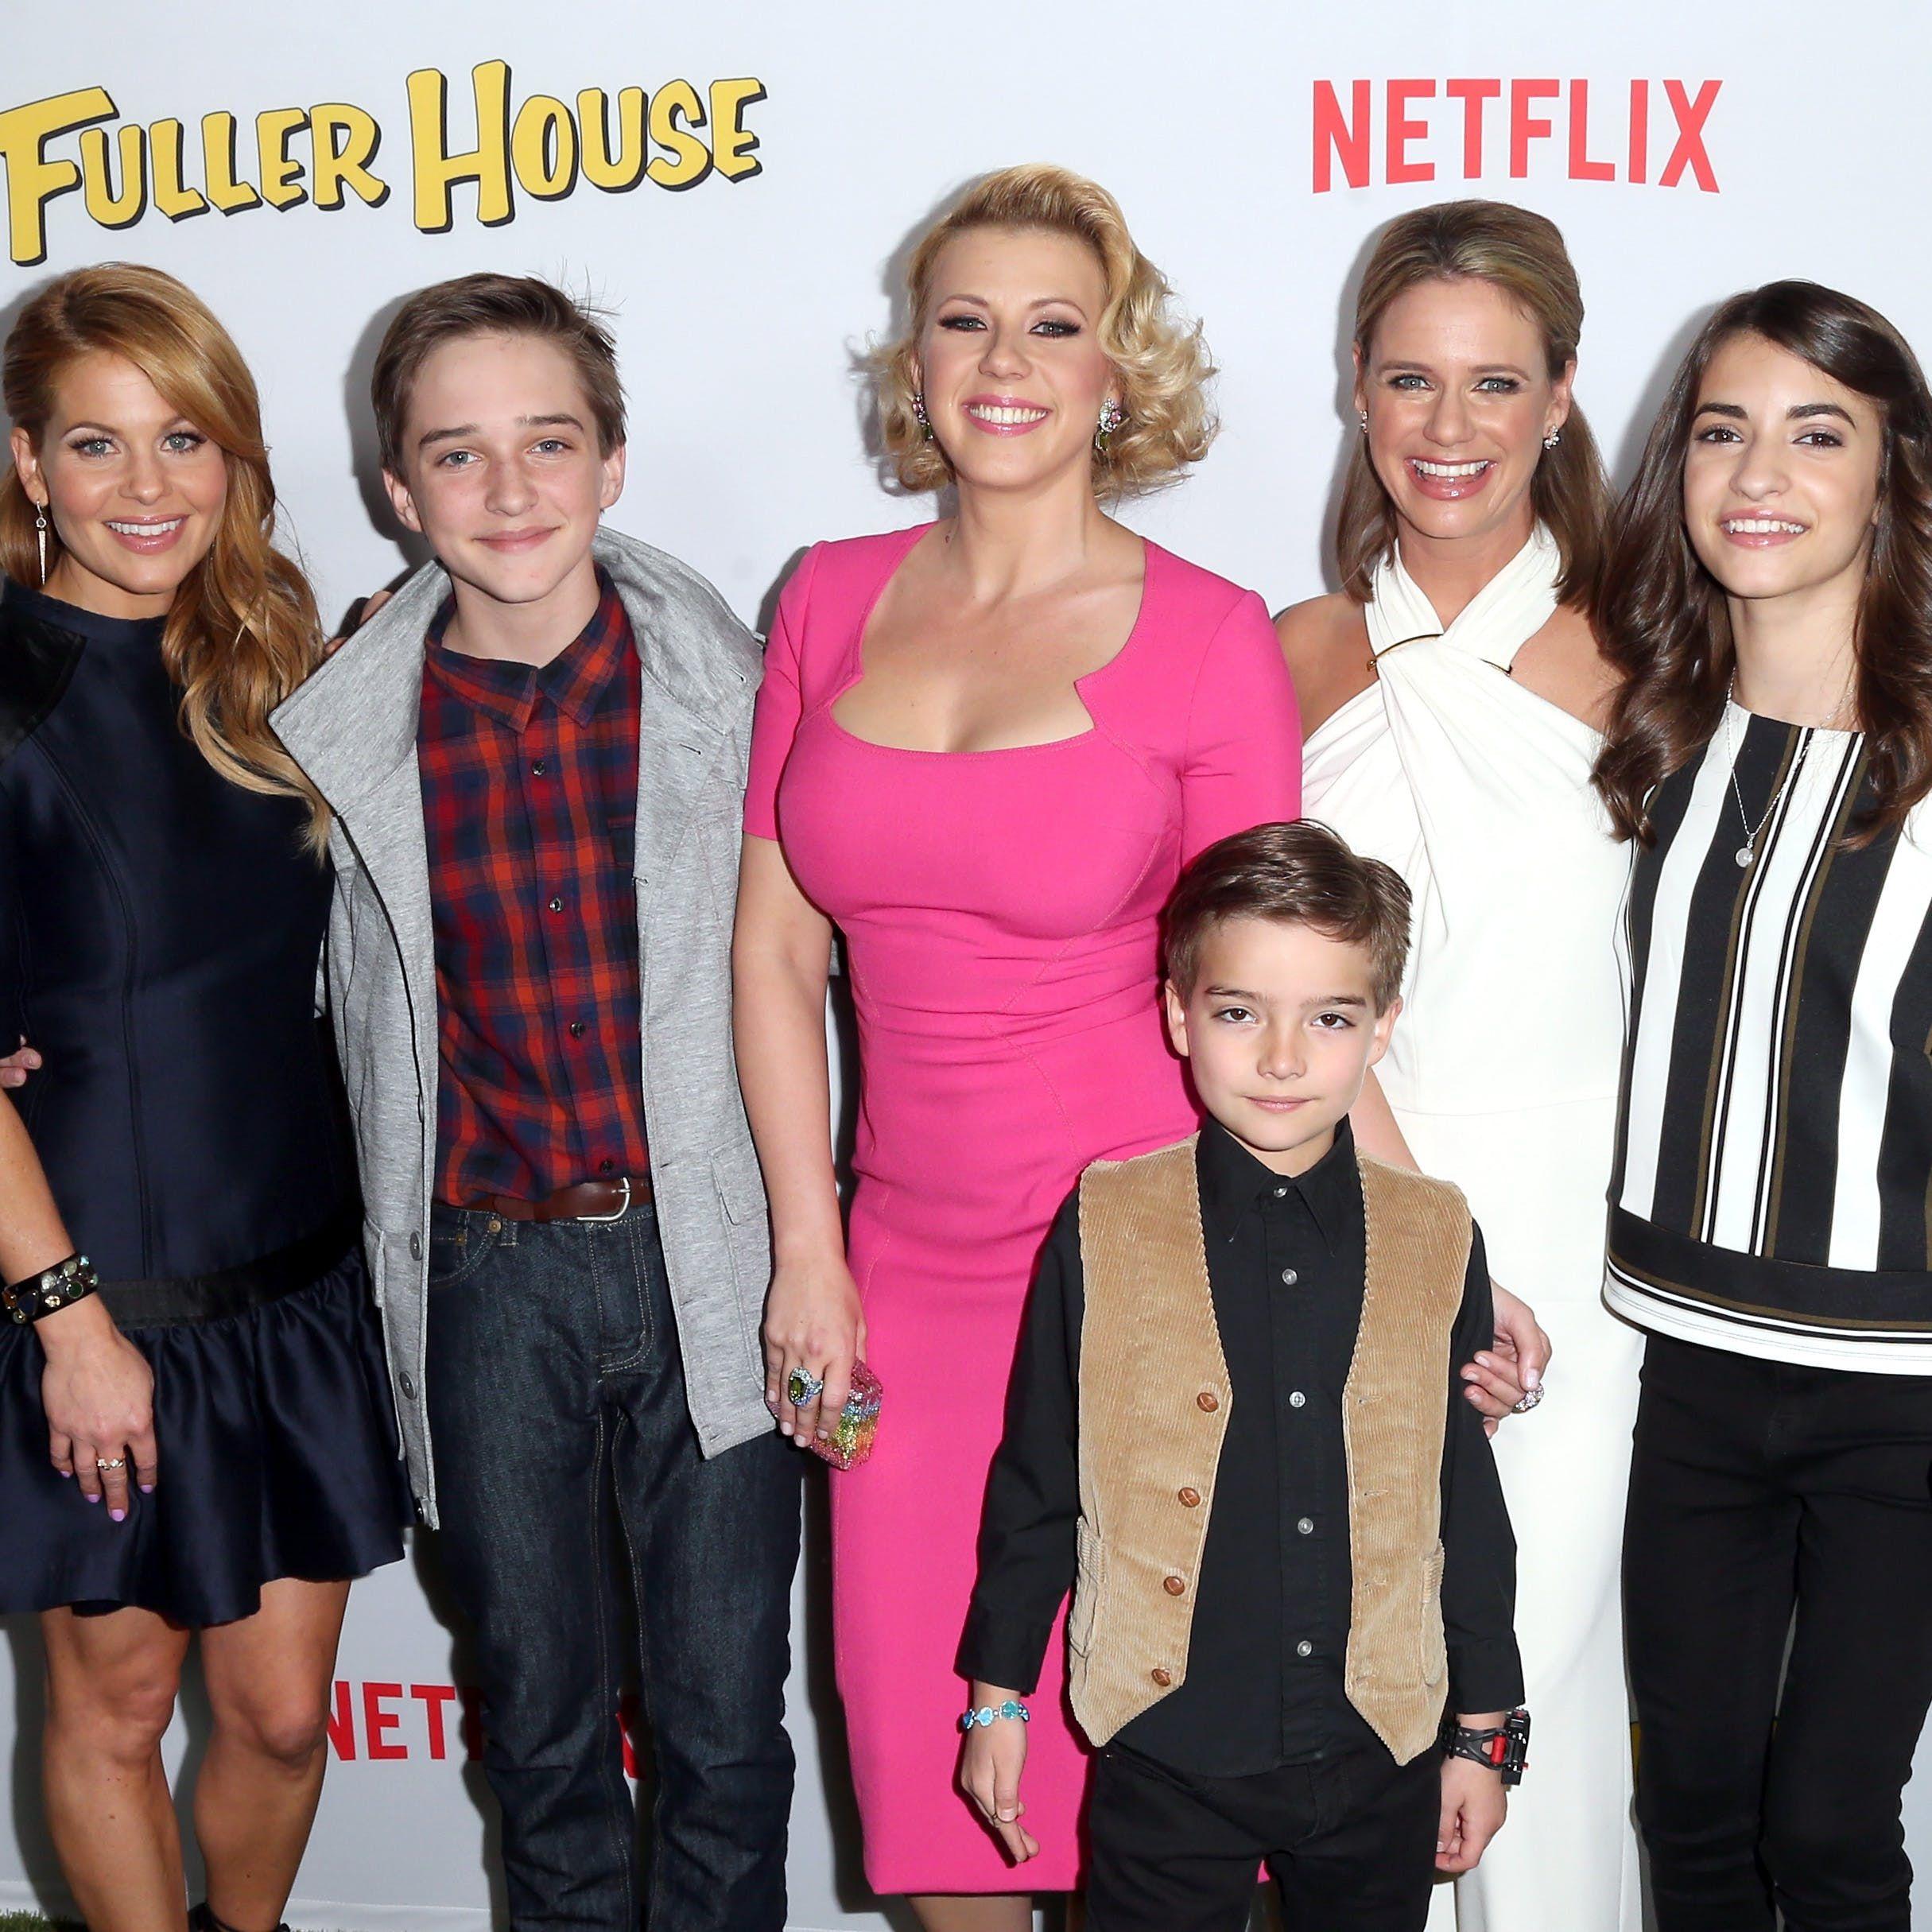 Fuller House Season 3 Is ing to Netflix Soon So Heres